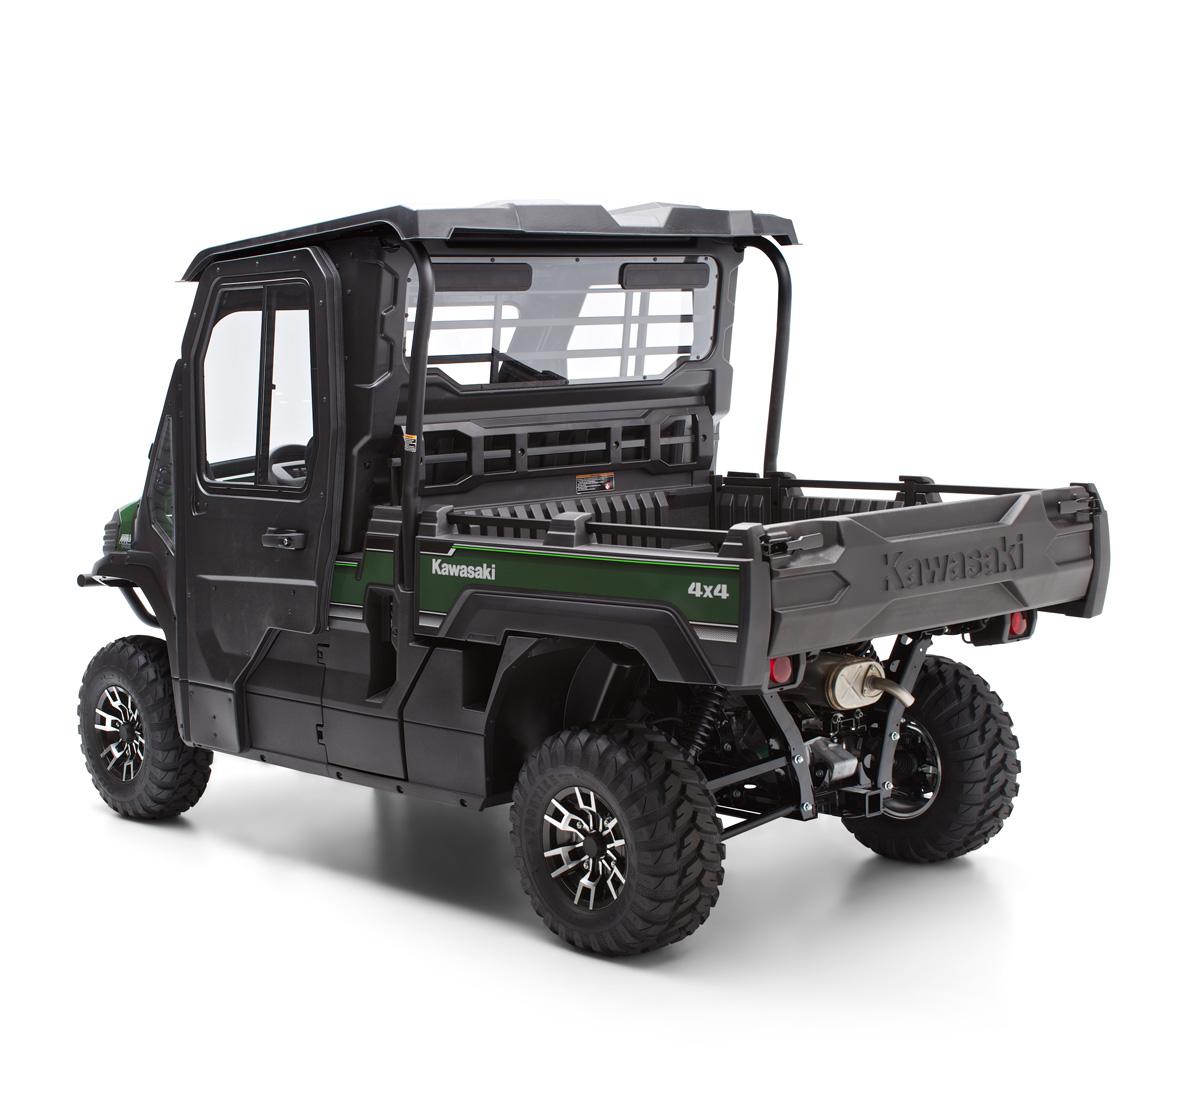 2016 Mule Pro Fx Hard Cab Enclosure Rear Panel